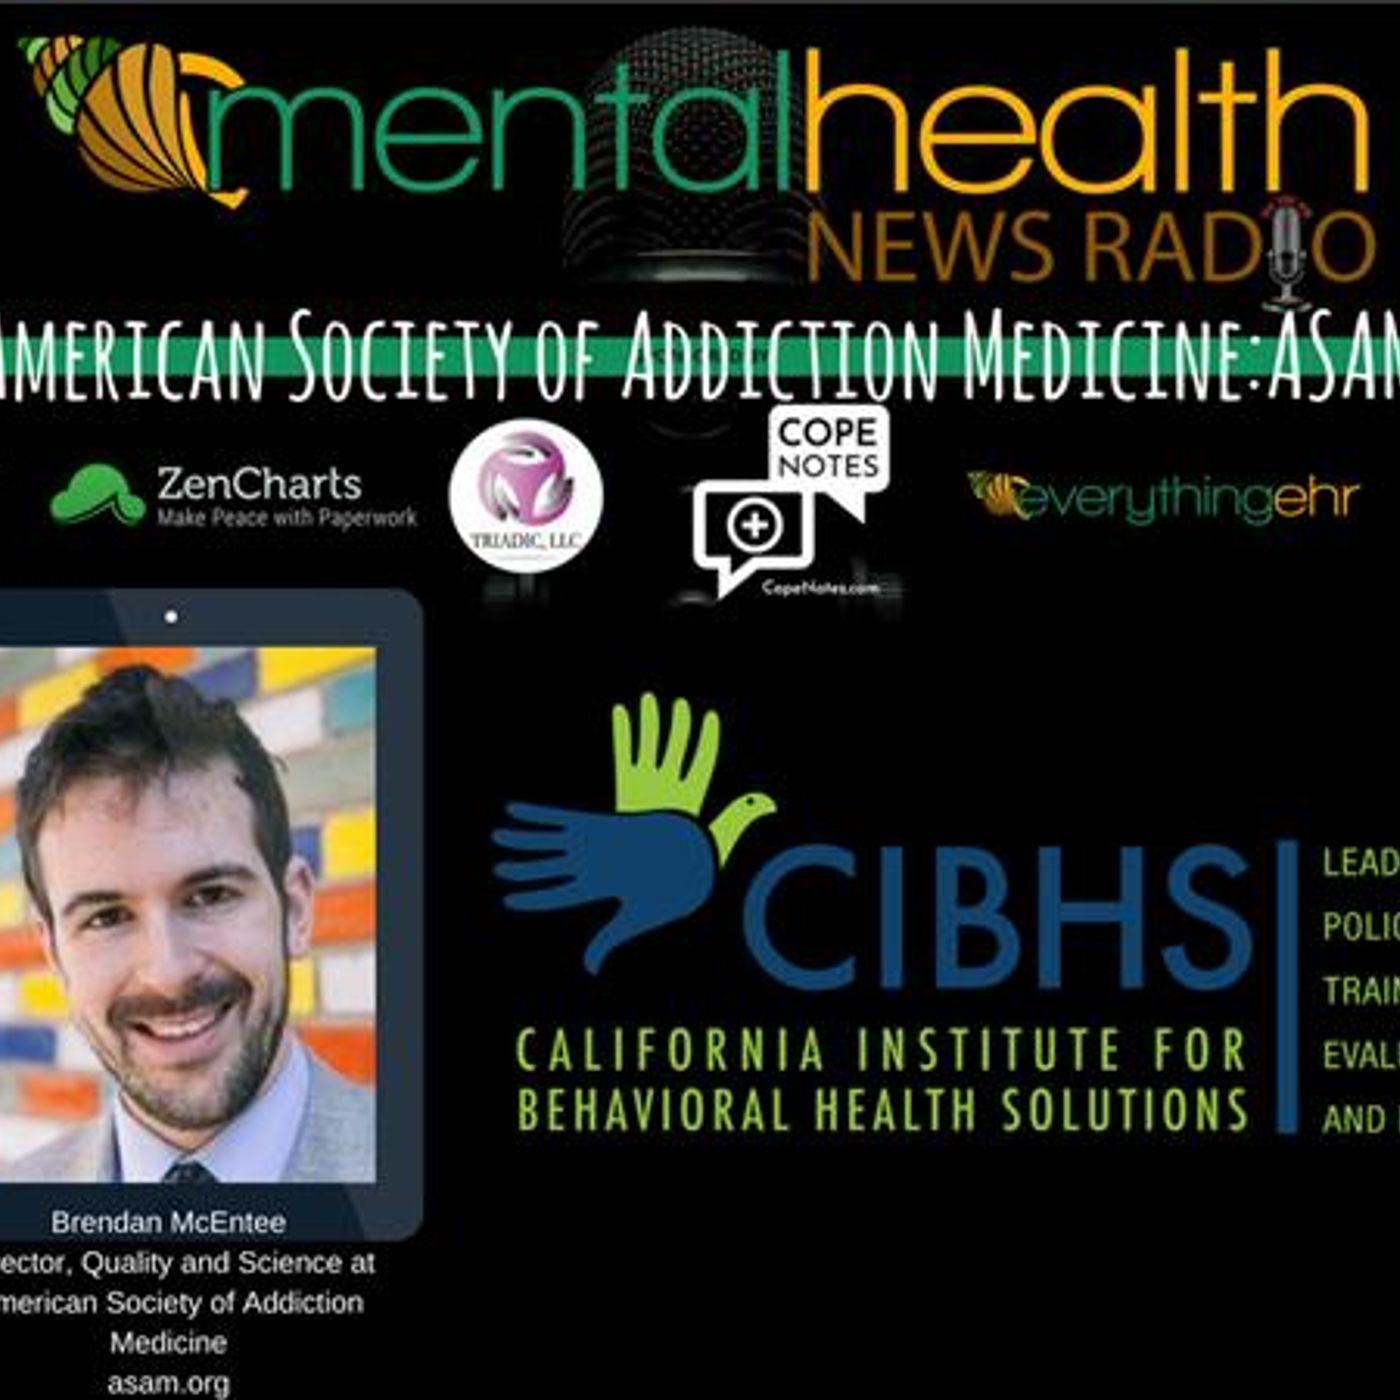 Mental Health News Radio - American Society of Addiction Medicine: ASAM with Brendan McEntee